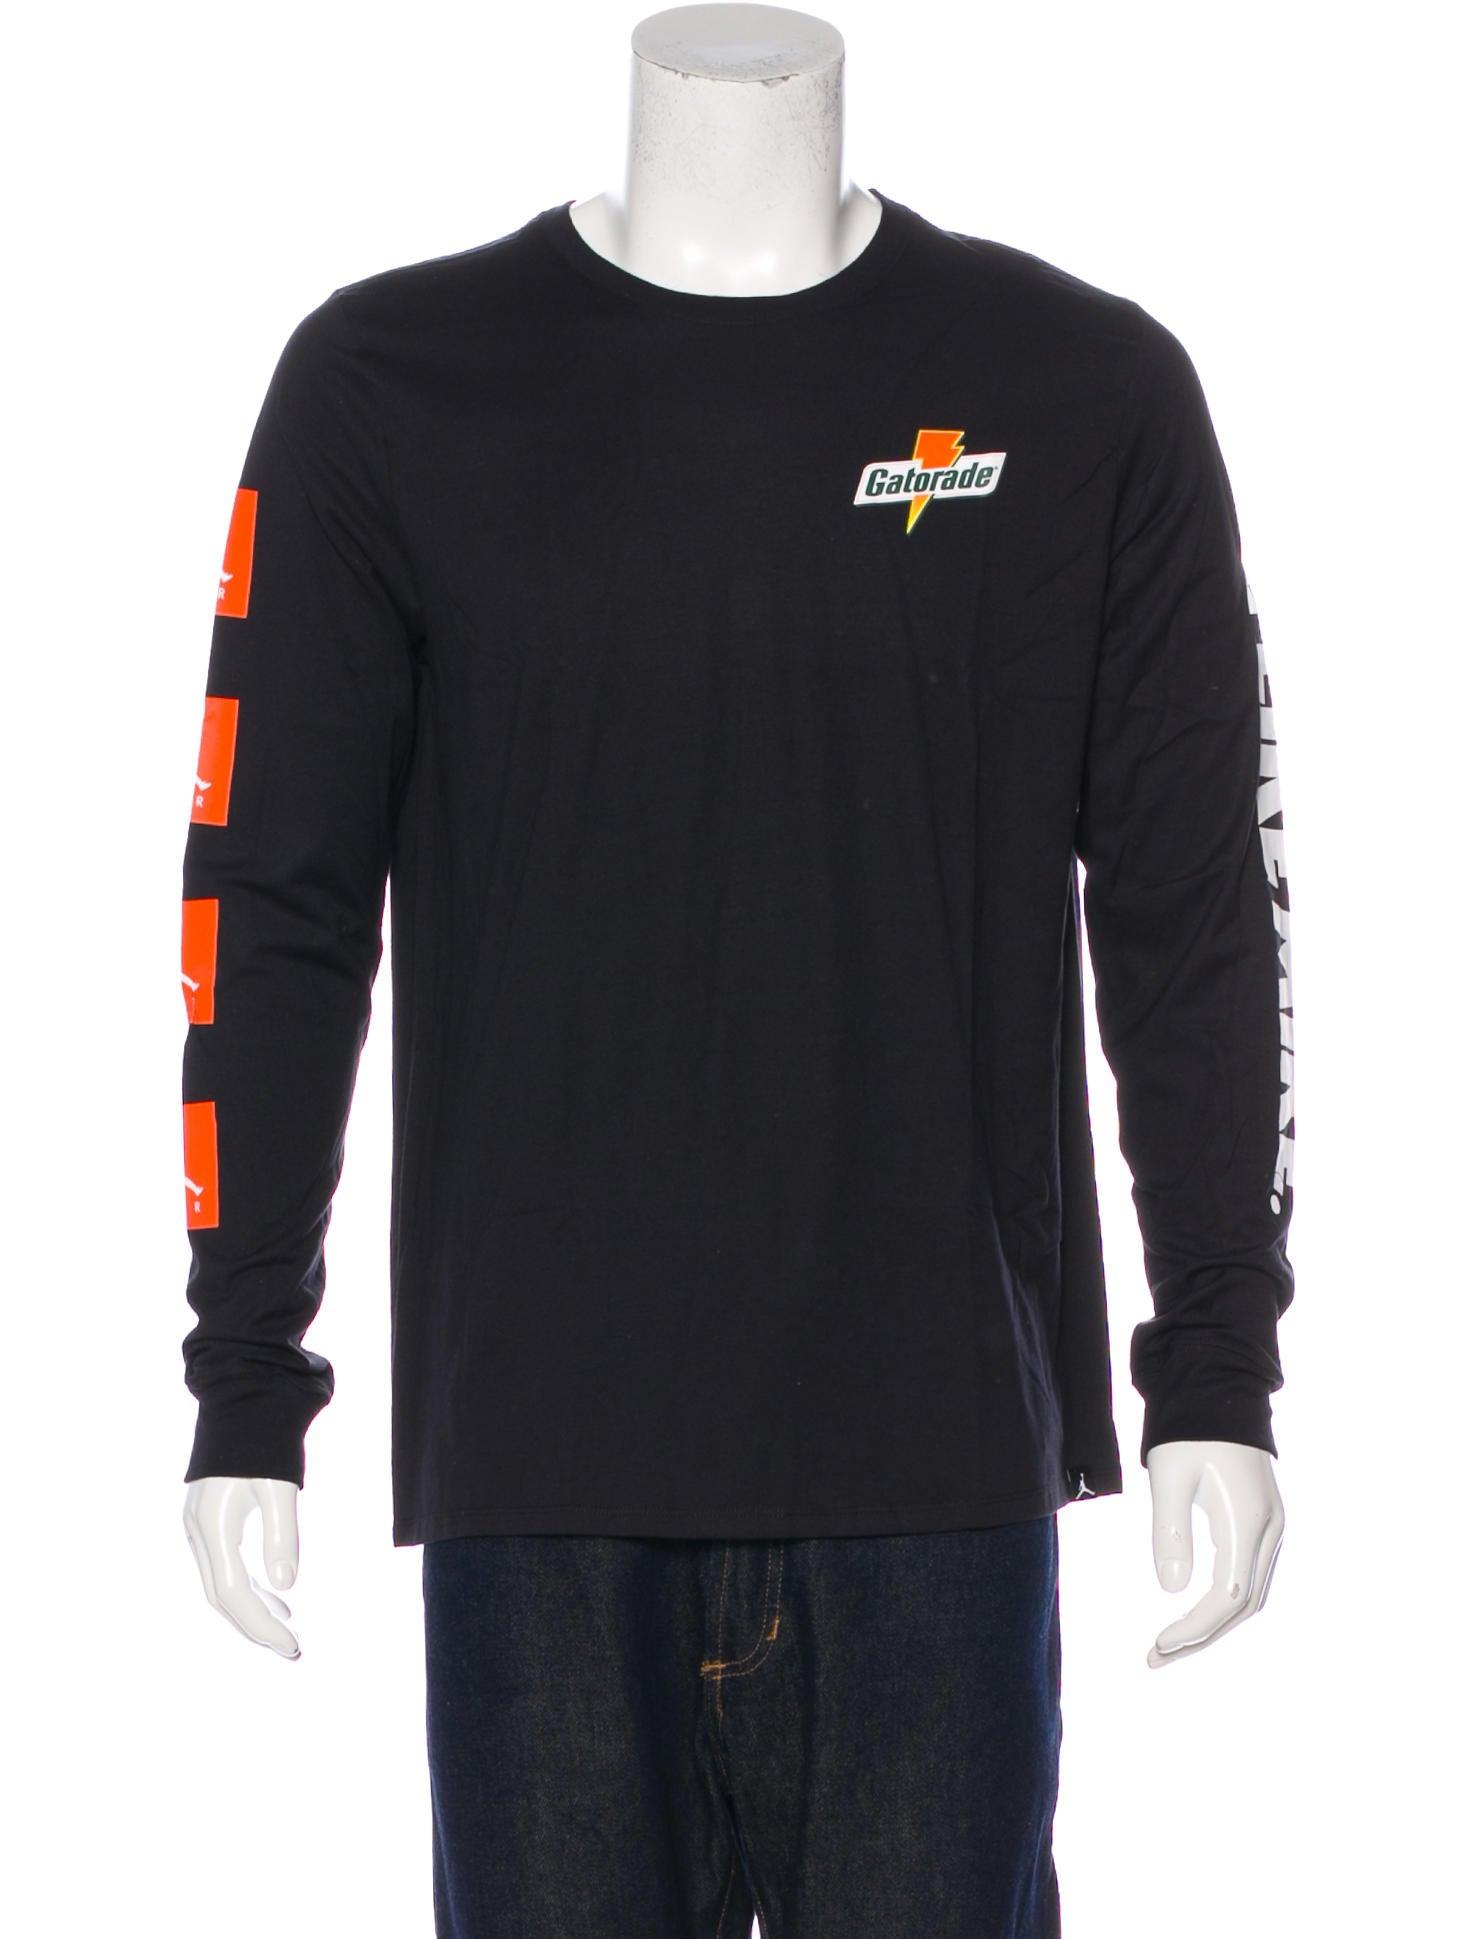 5f004a40304 Nike Air Jordan Gatorade Long Sleeve T-Shirt - Clothing - WNIAJ20770 ...